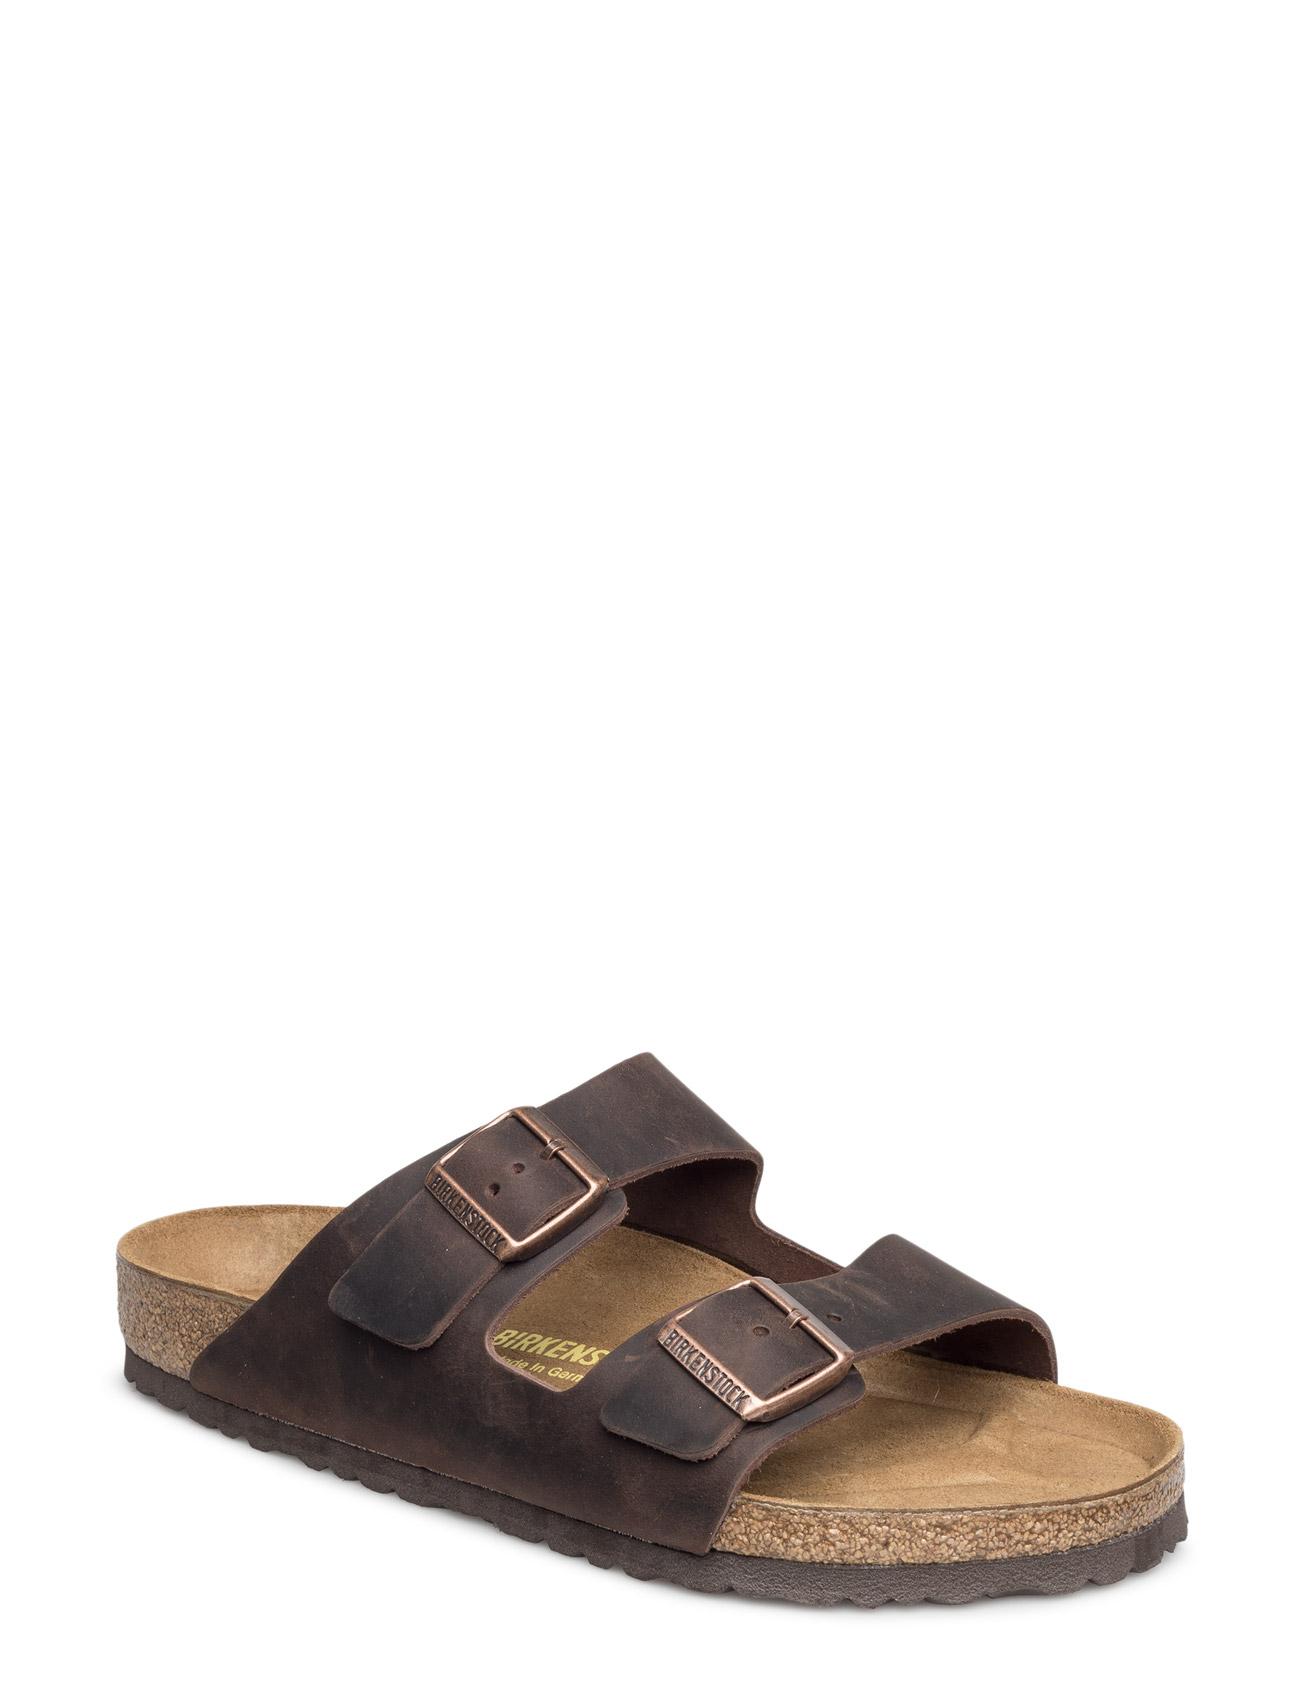 Arizona Leoi S Black Birkenstock Sandaler til Damer i